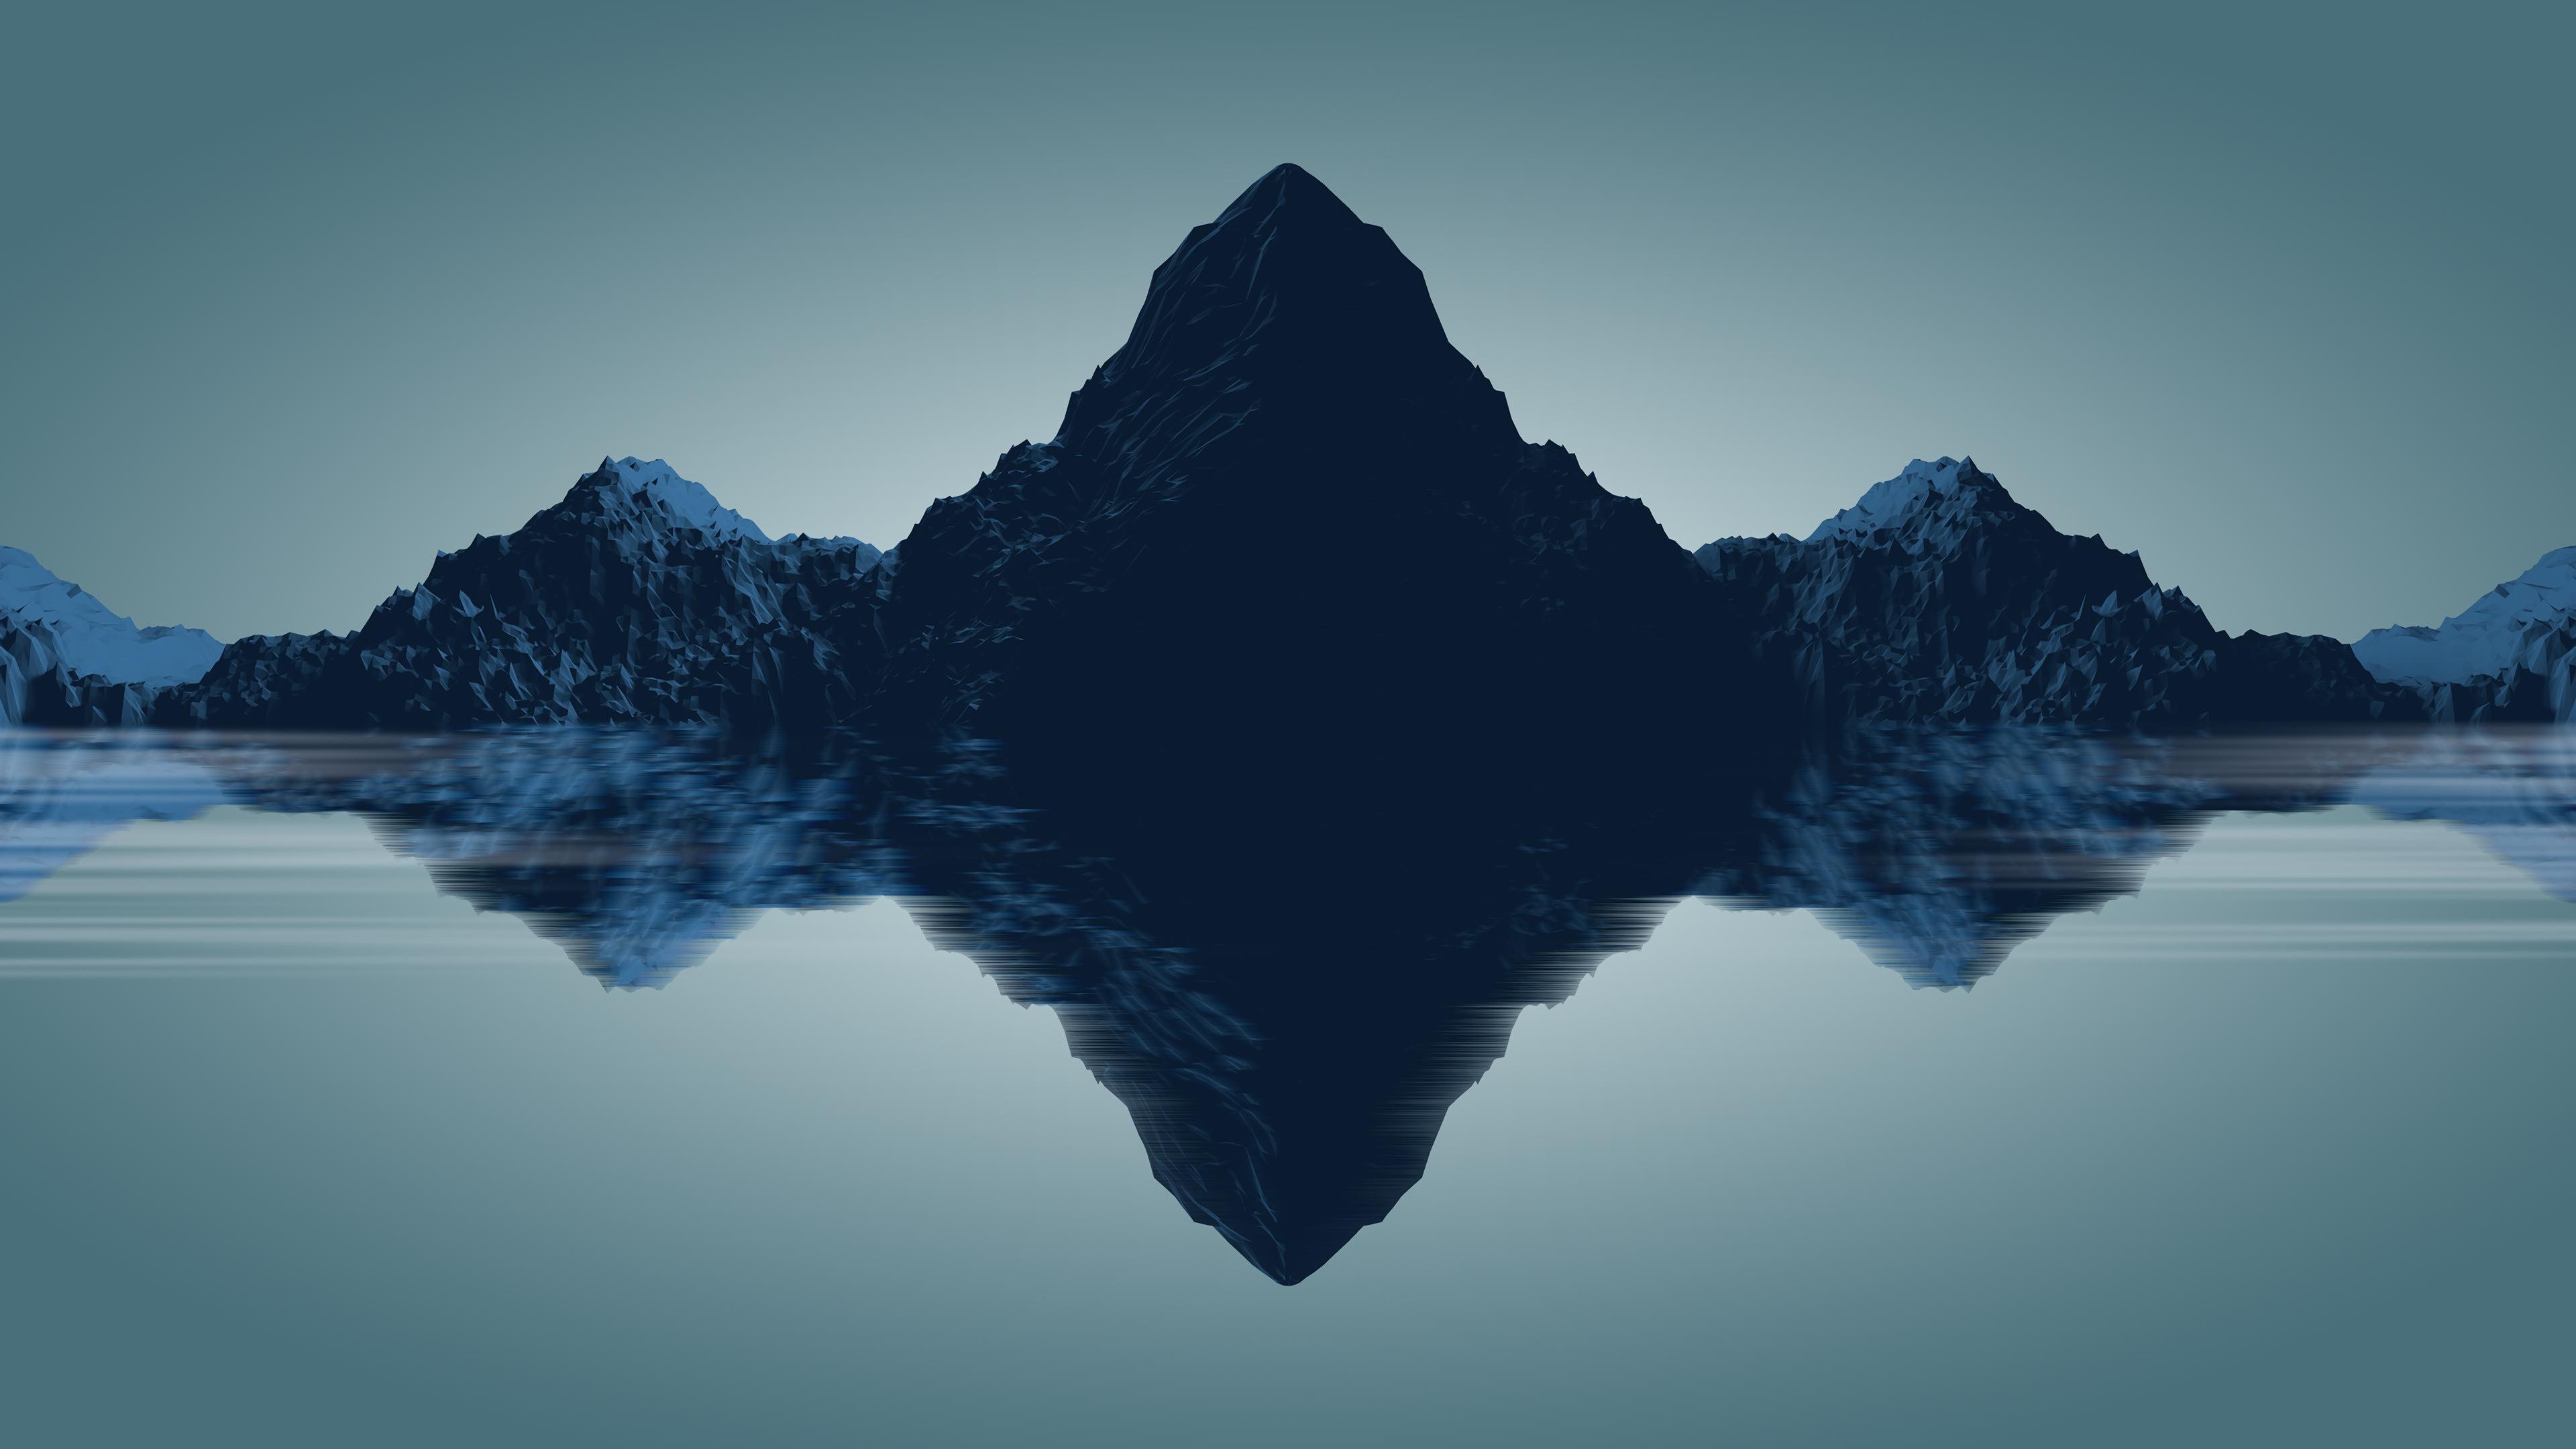 Wallpaper Mountains Minimalist Low Poly Art